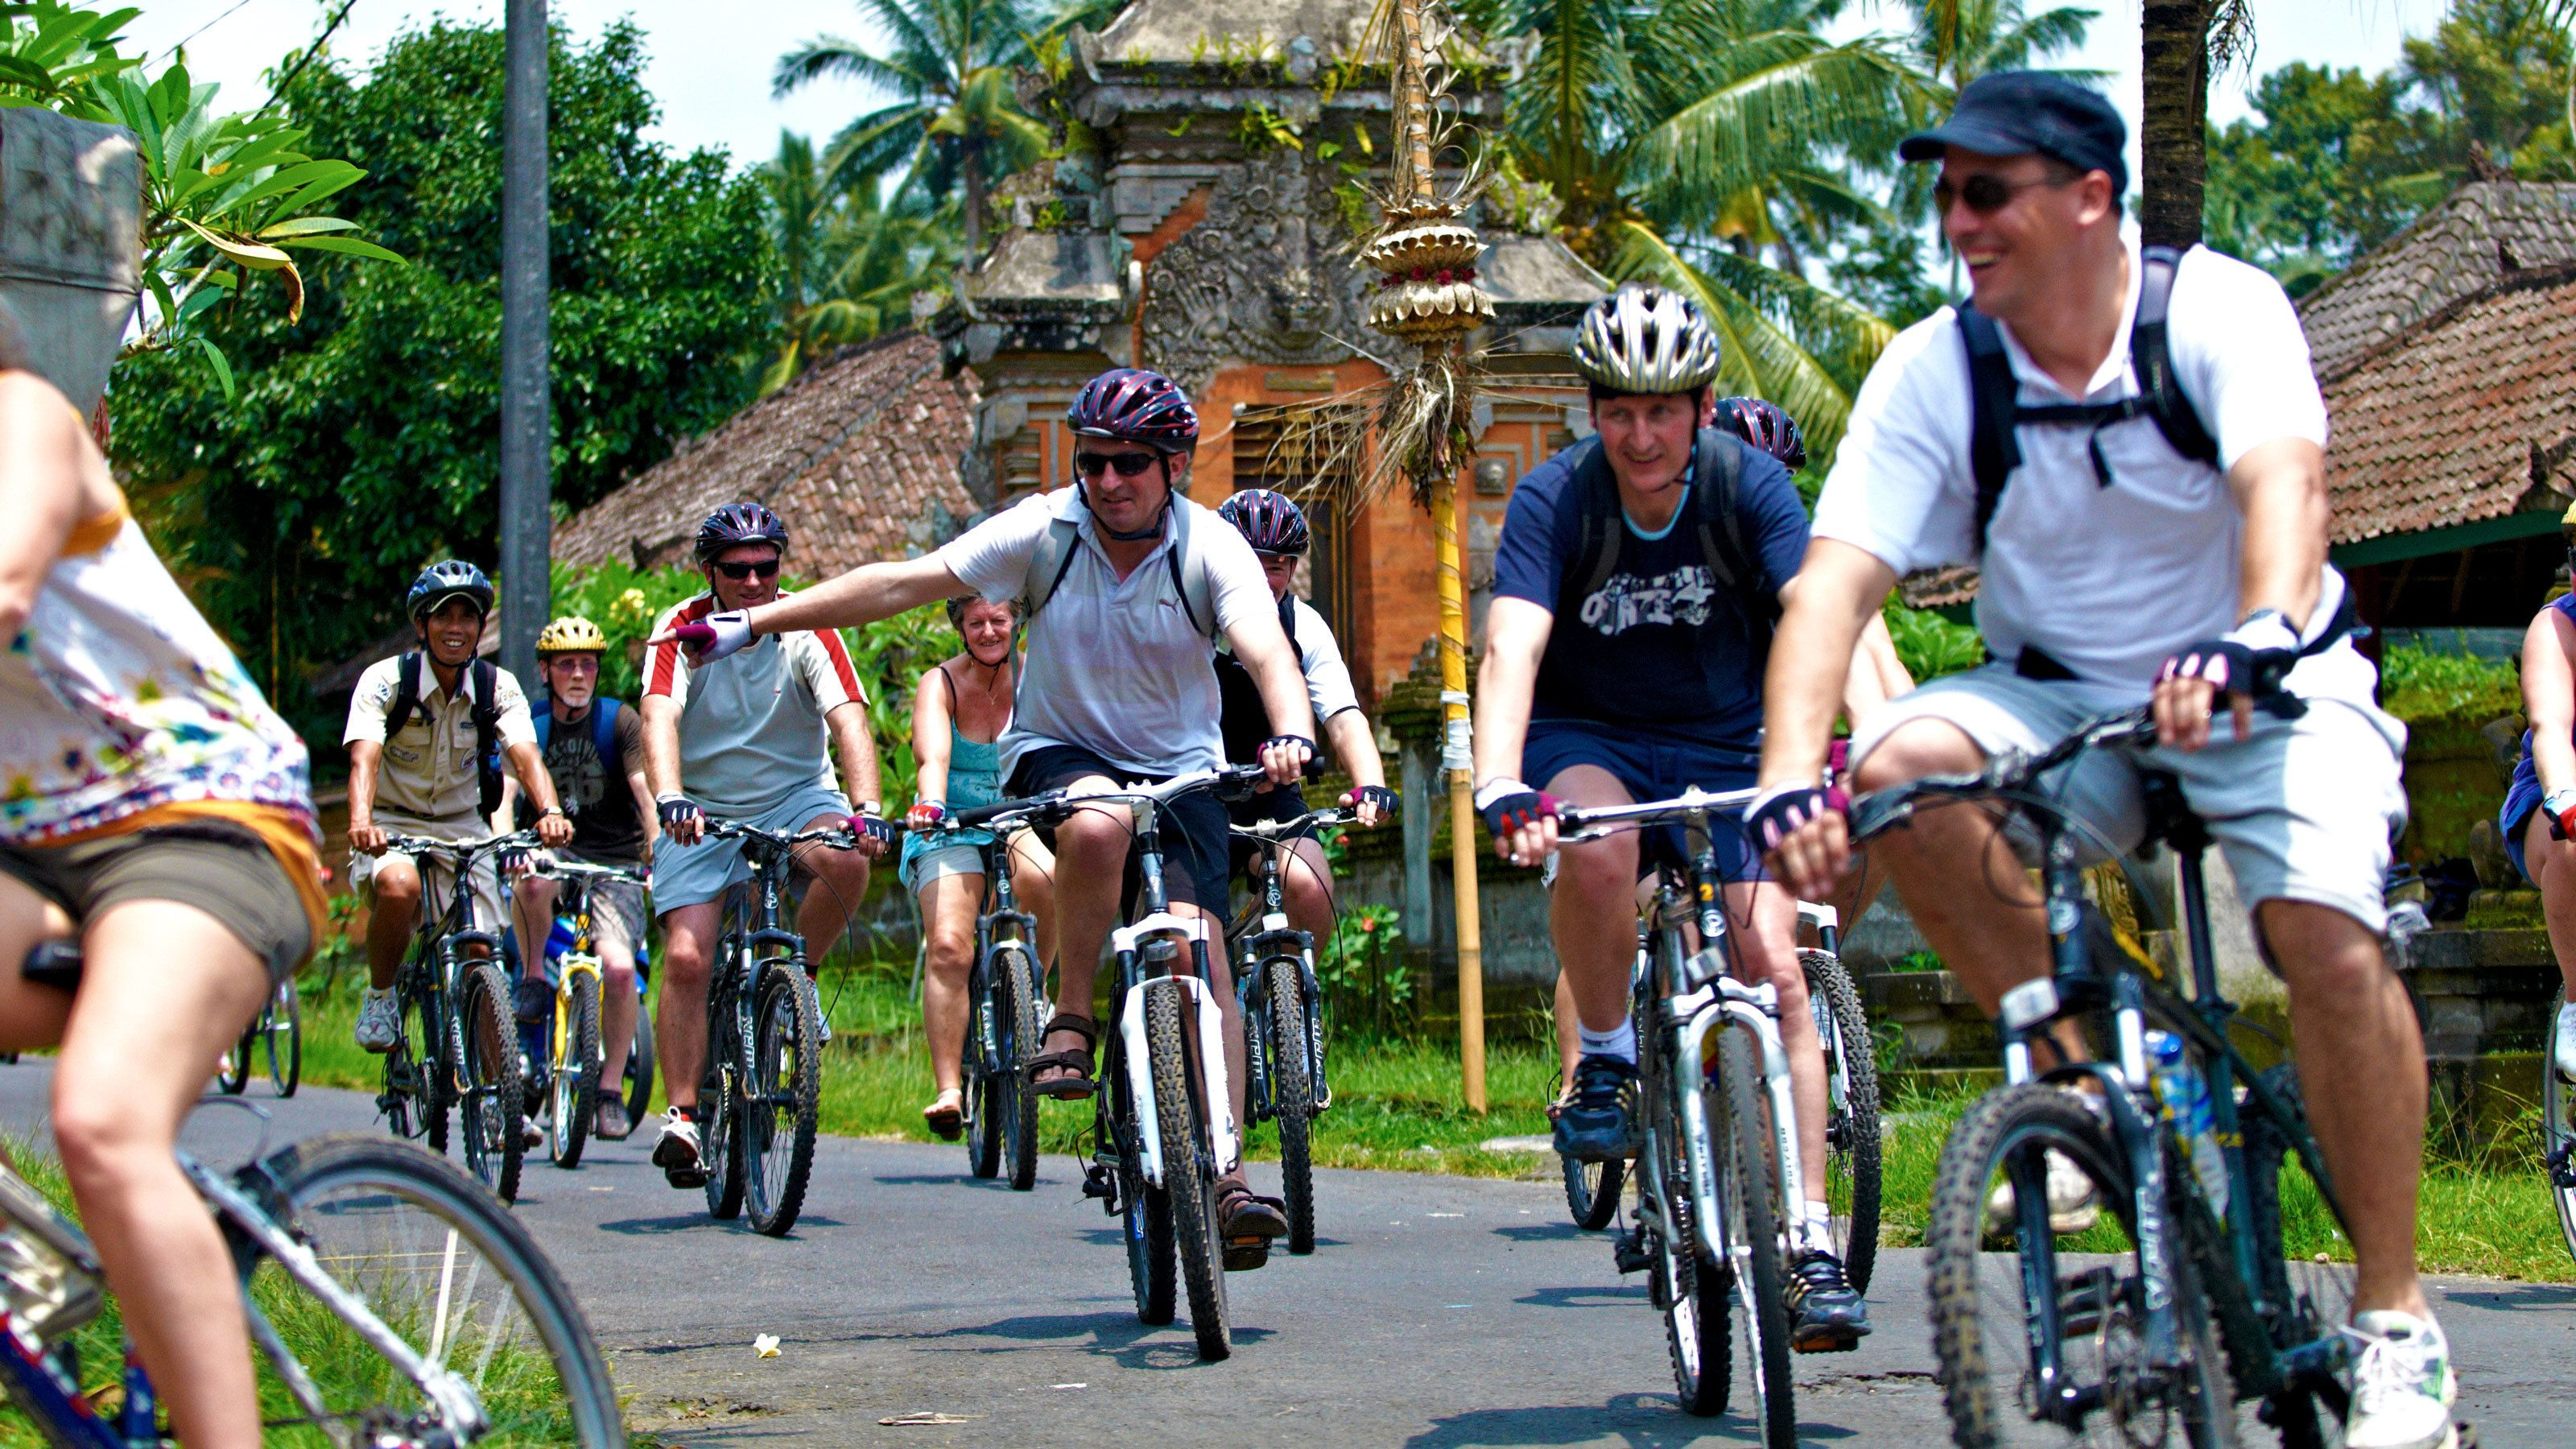 Carangsari Village Cycling Excursion